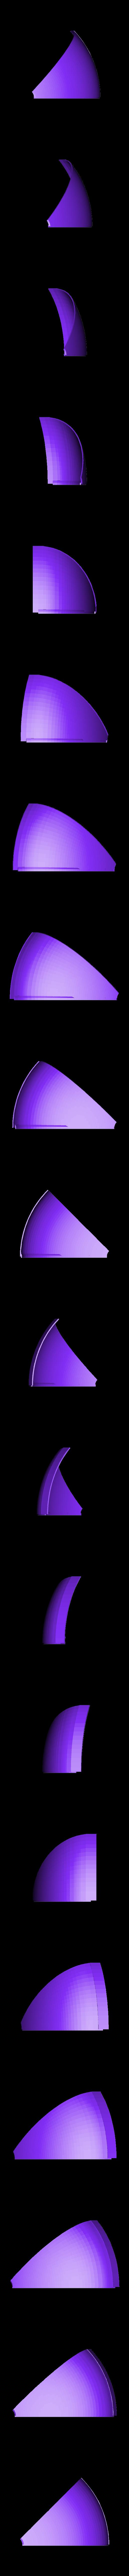 S5 06-Y_01_x7.stl Download STL file apollo 15 saturn 5 pack 1/4 stage S1C • Design to 3D print, theamphioxus